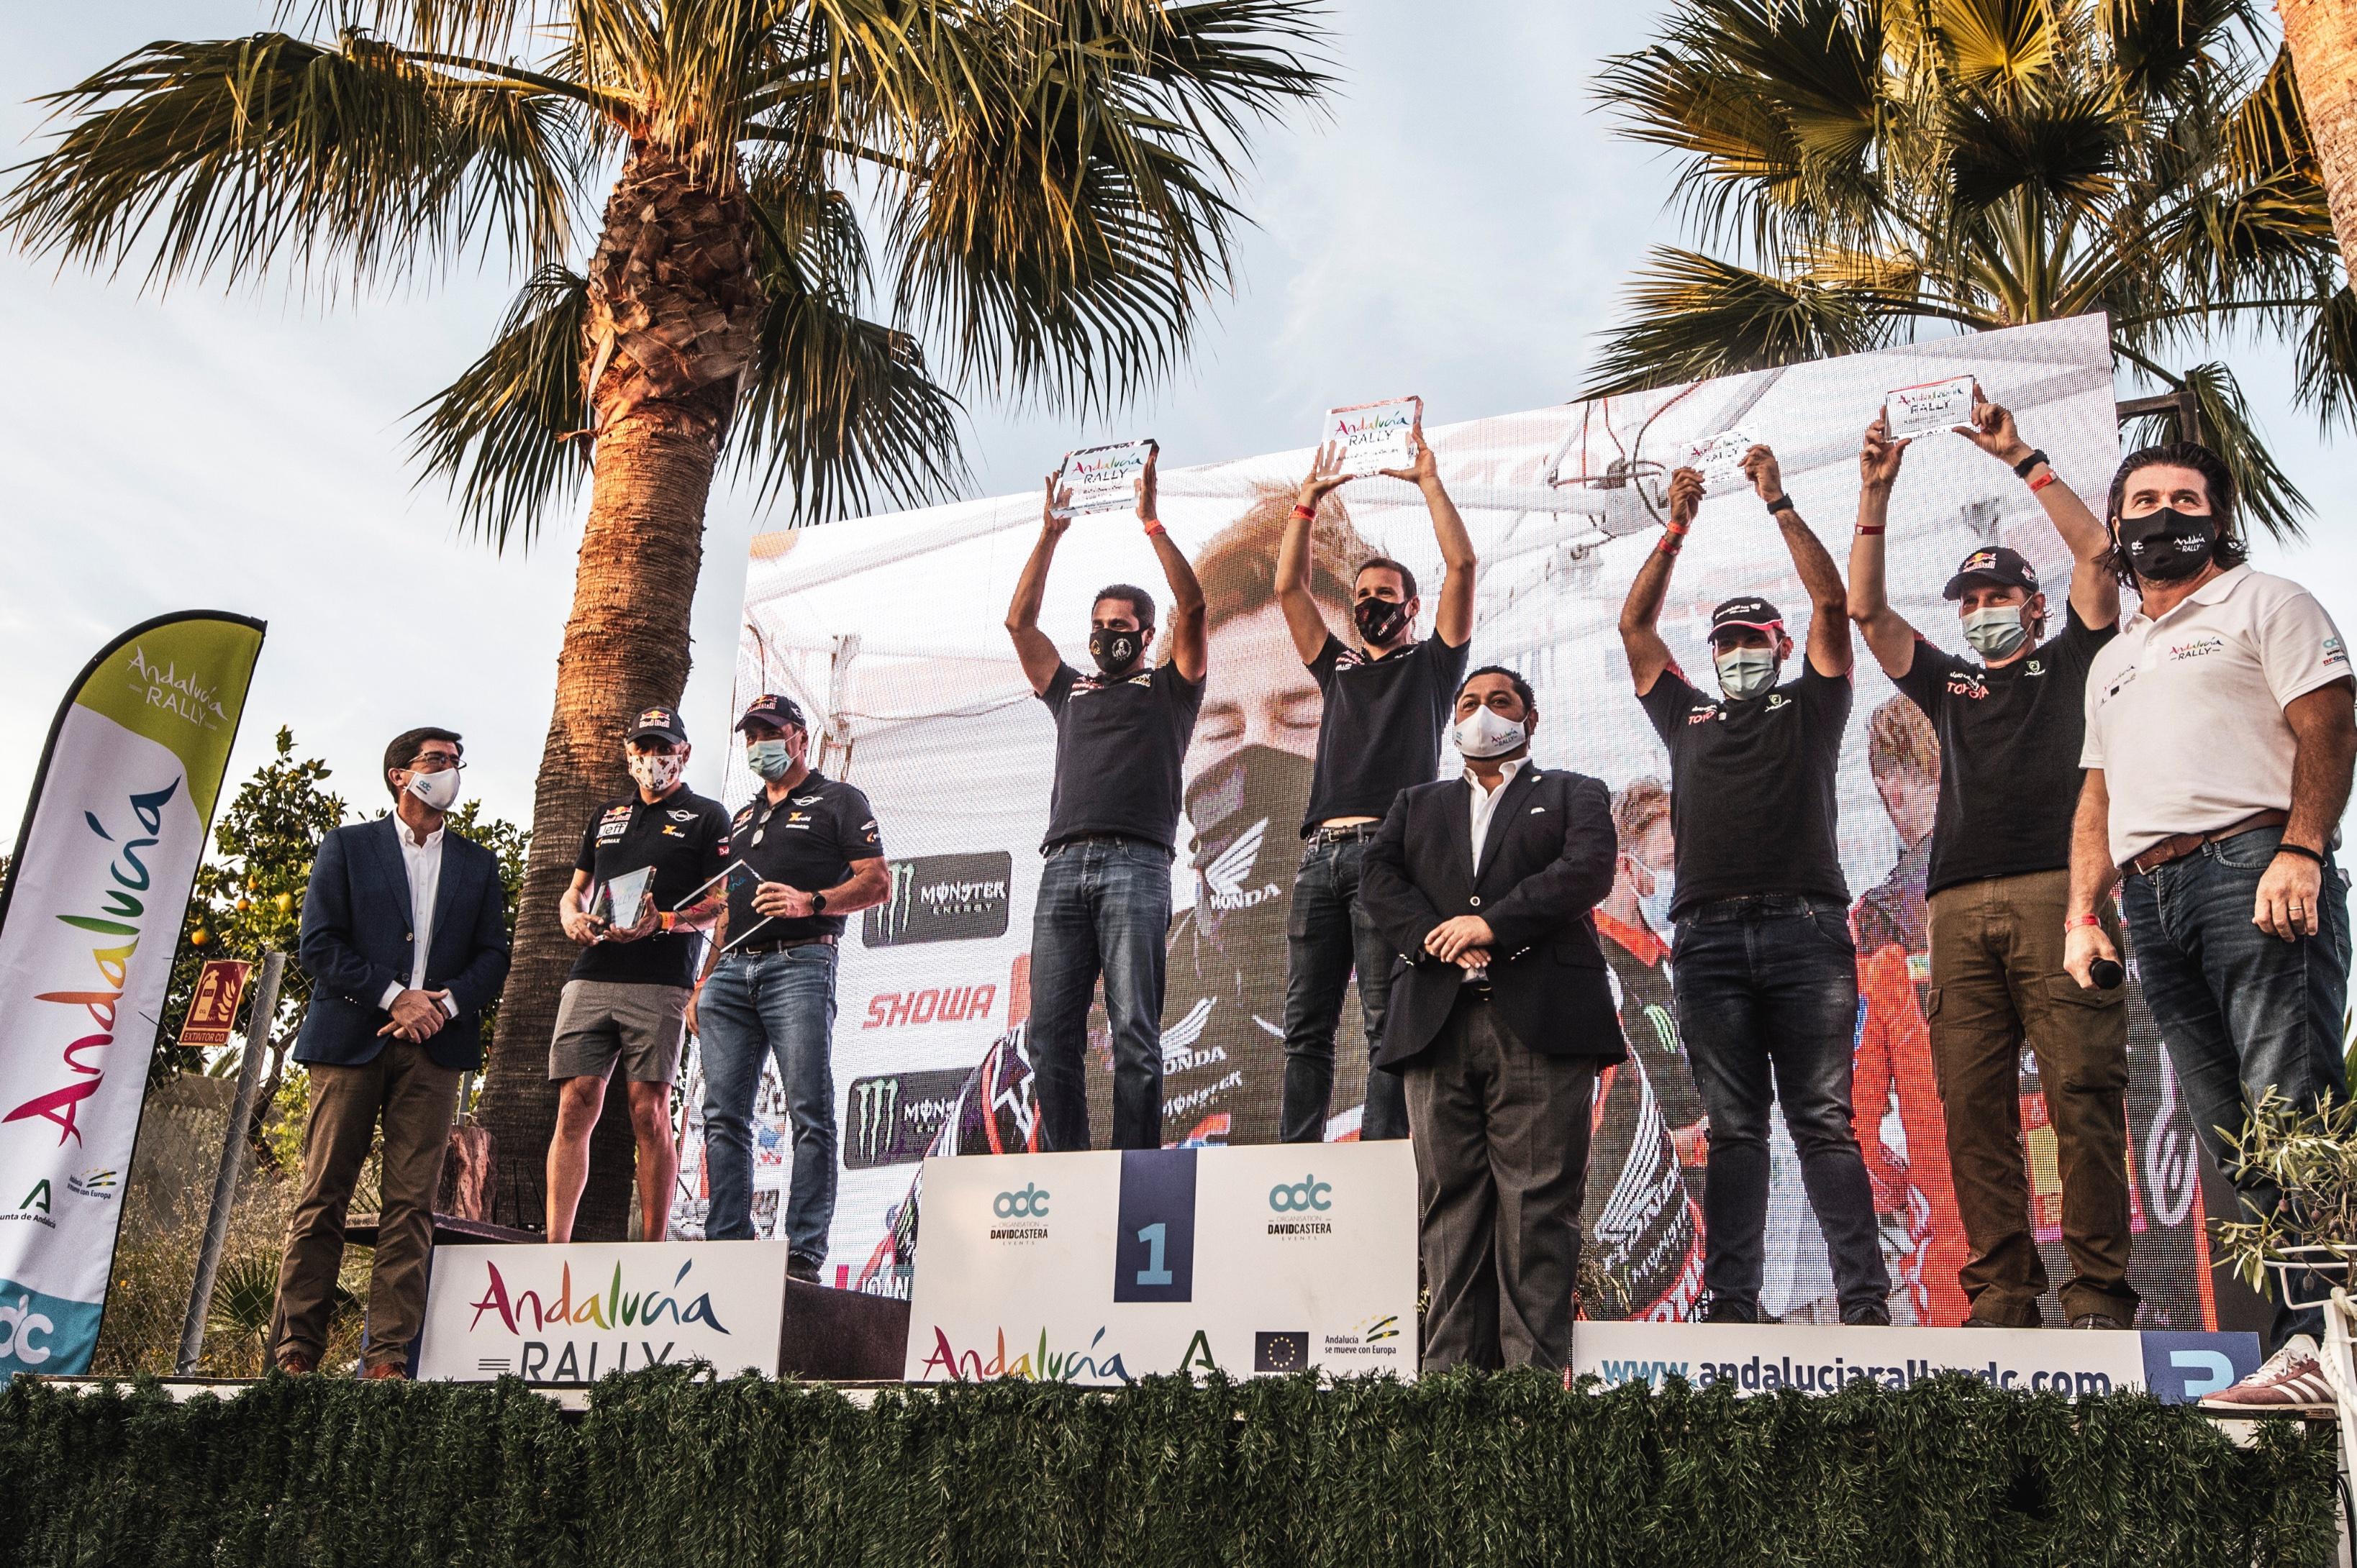 2020 42º Rallye Raid Dakar - Arabia Saudí [5-17 Enero] - Página 14 Ej_rg9bXcAY1rxm?format=jpg&name=4096x4096